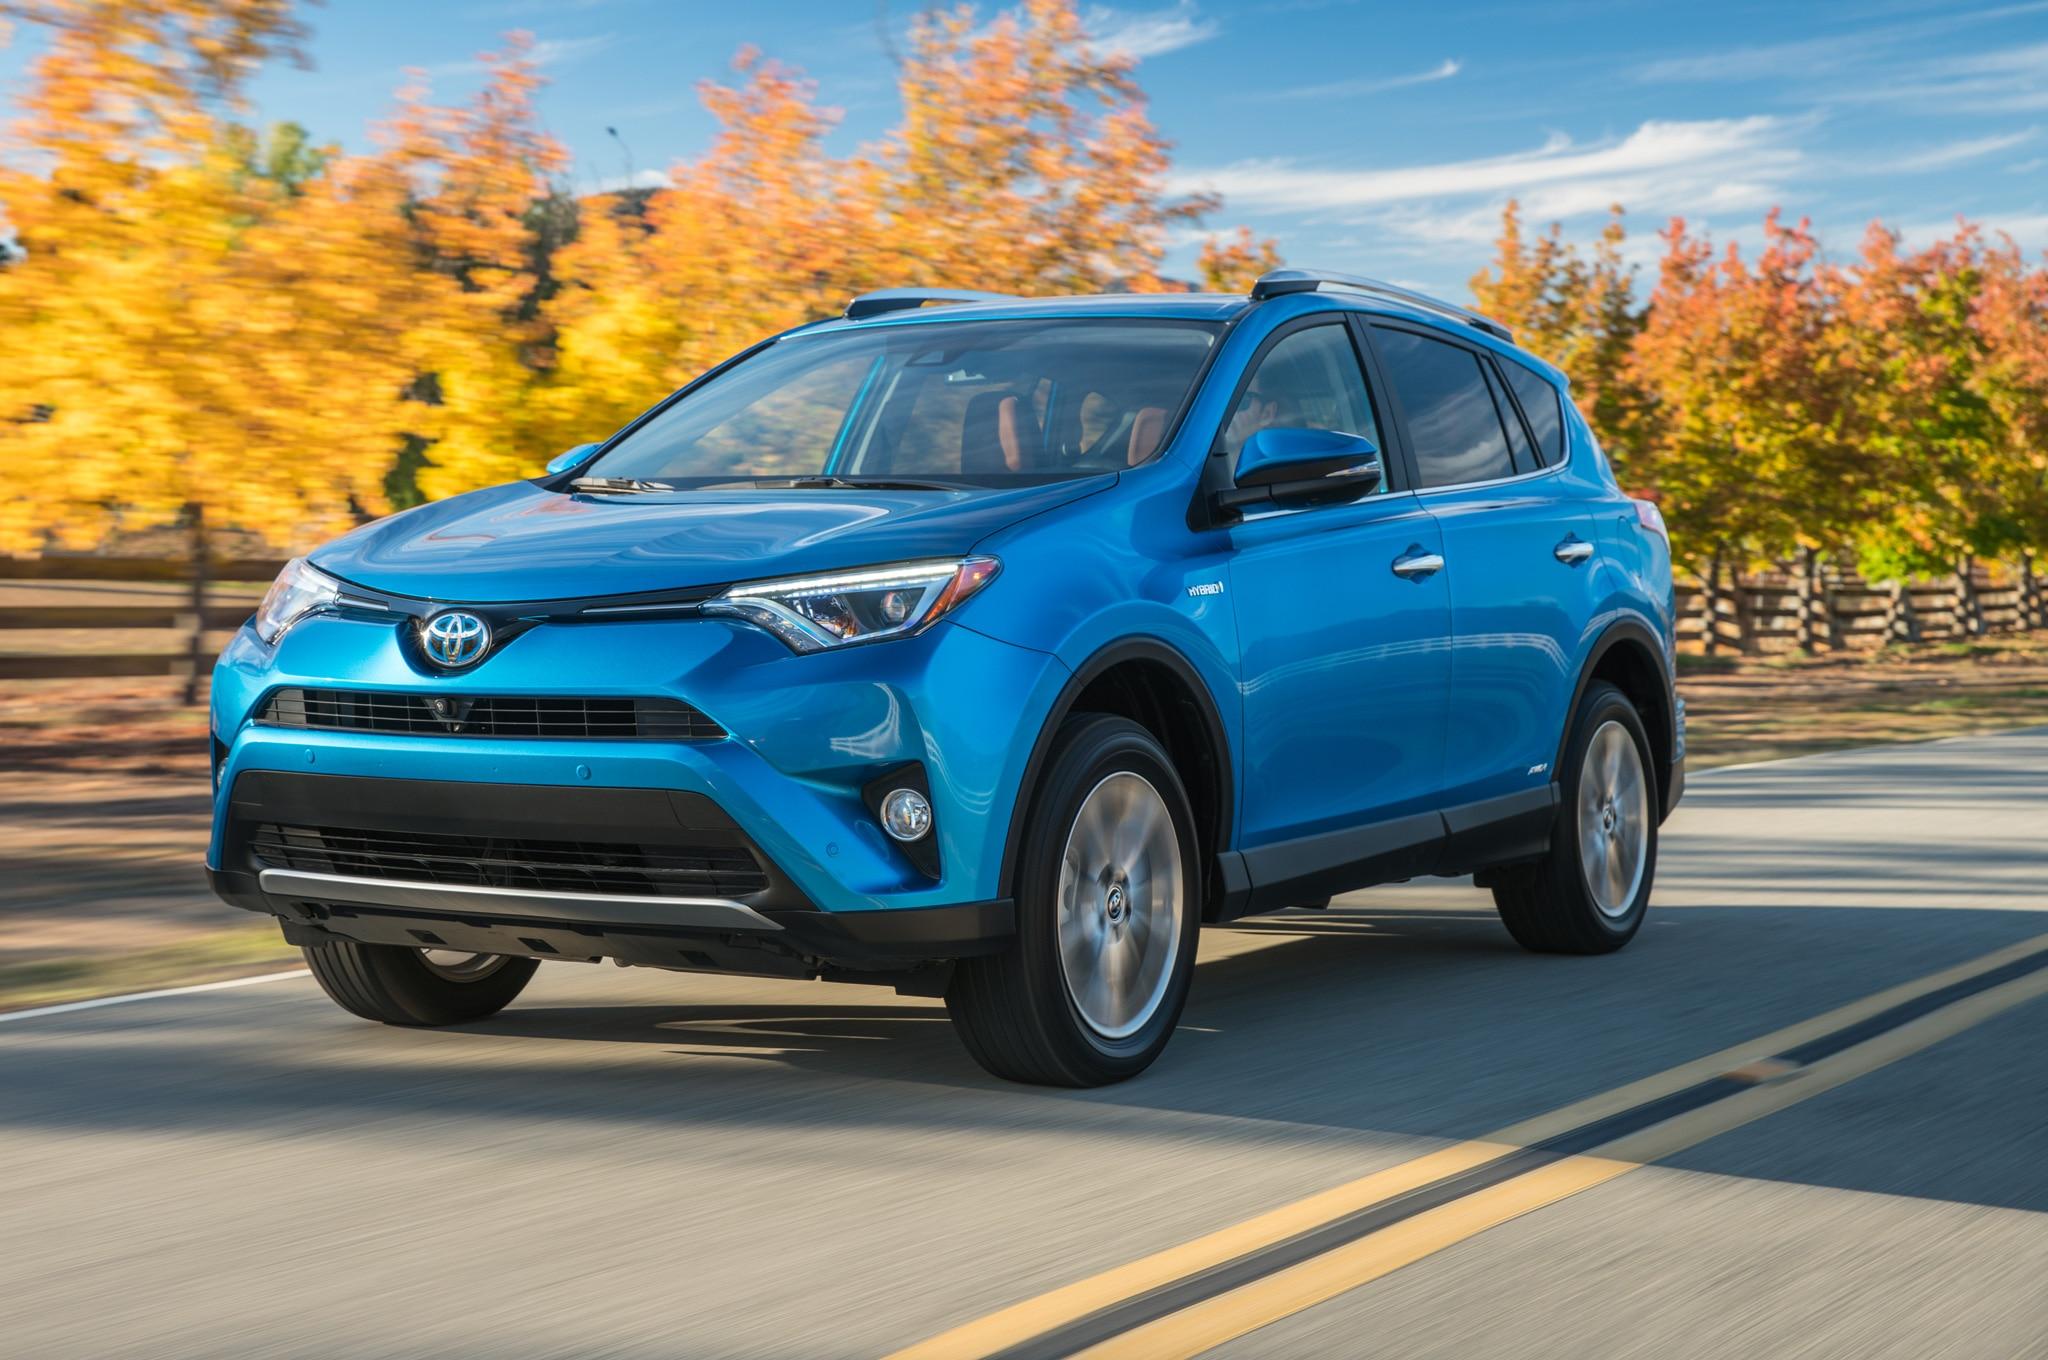 2016 Toyota Rav4 Hybrid Limited Review 78 Adver To Skip 1